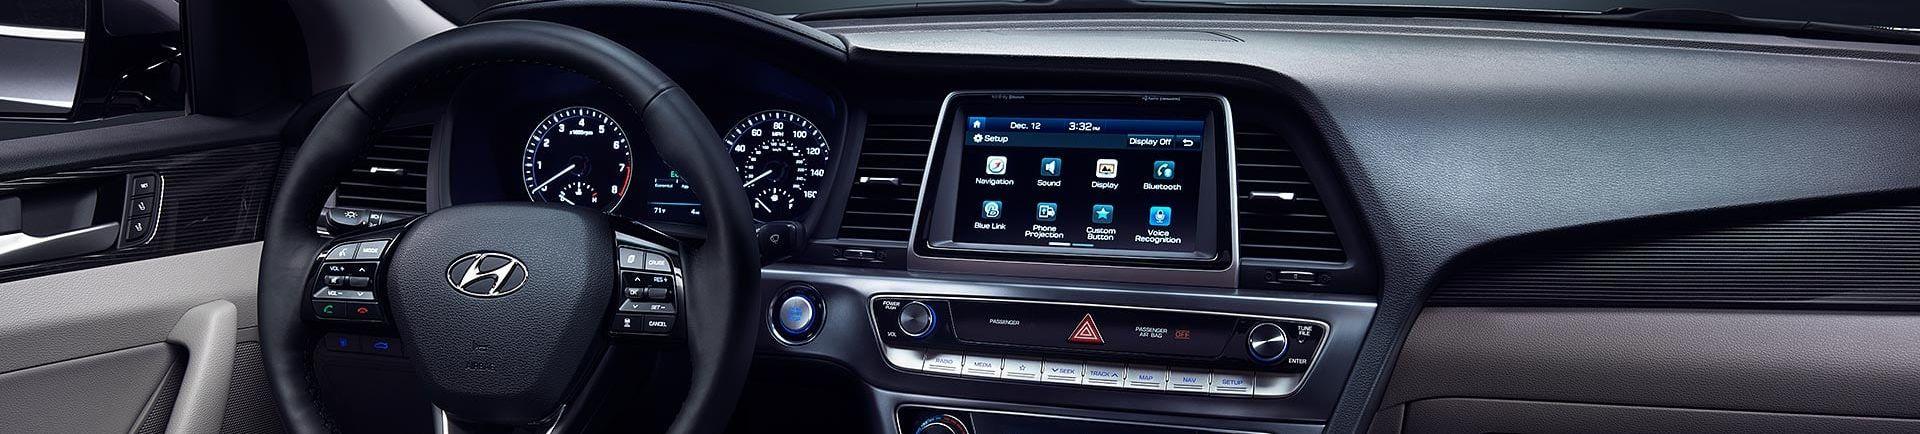 2019 Hyundai Sonata Center Console